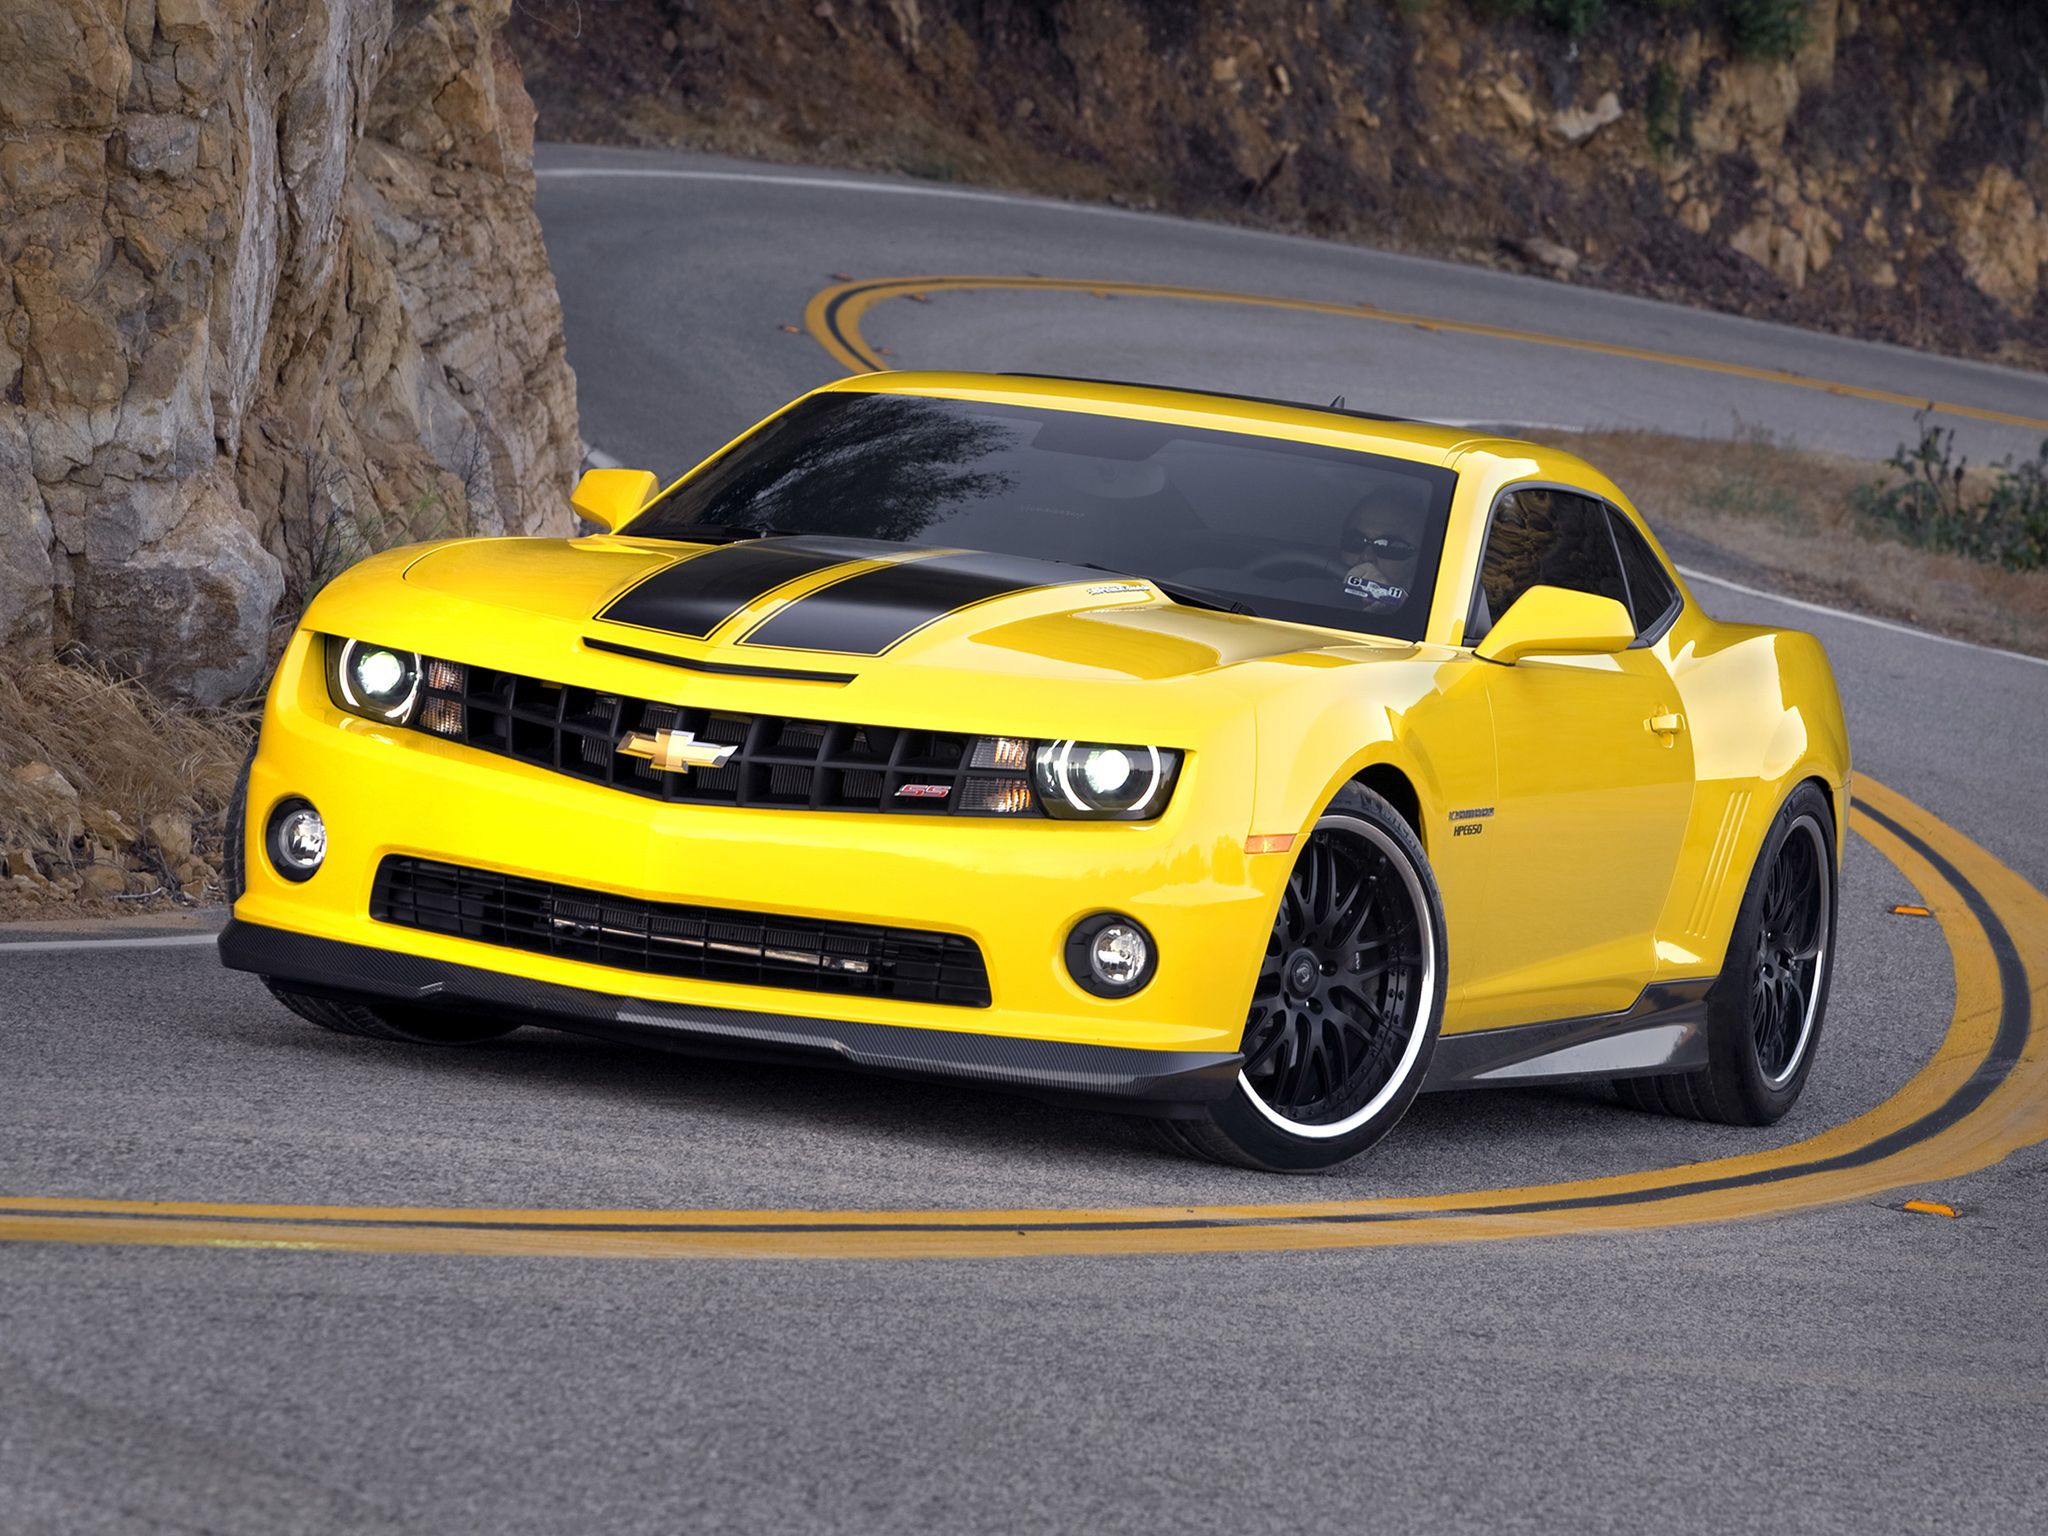 Yellow Camaro Wallpapers Top Free Yellow Camaro Backgrounds Wallpaperaccess